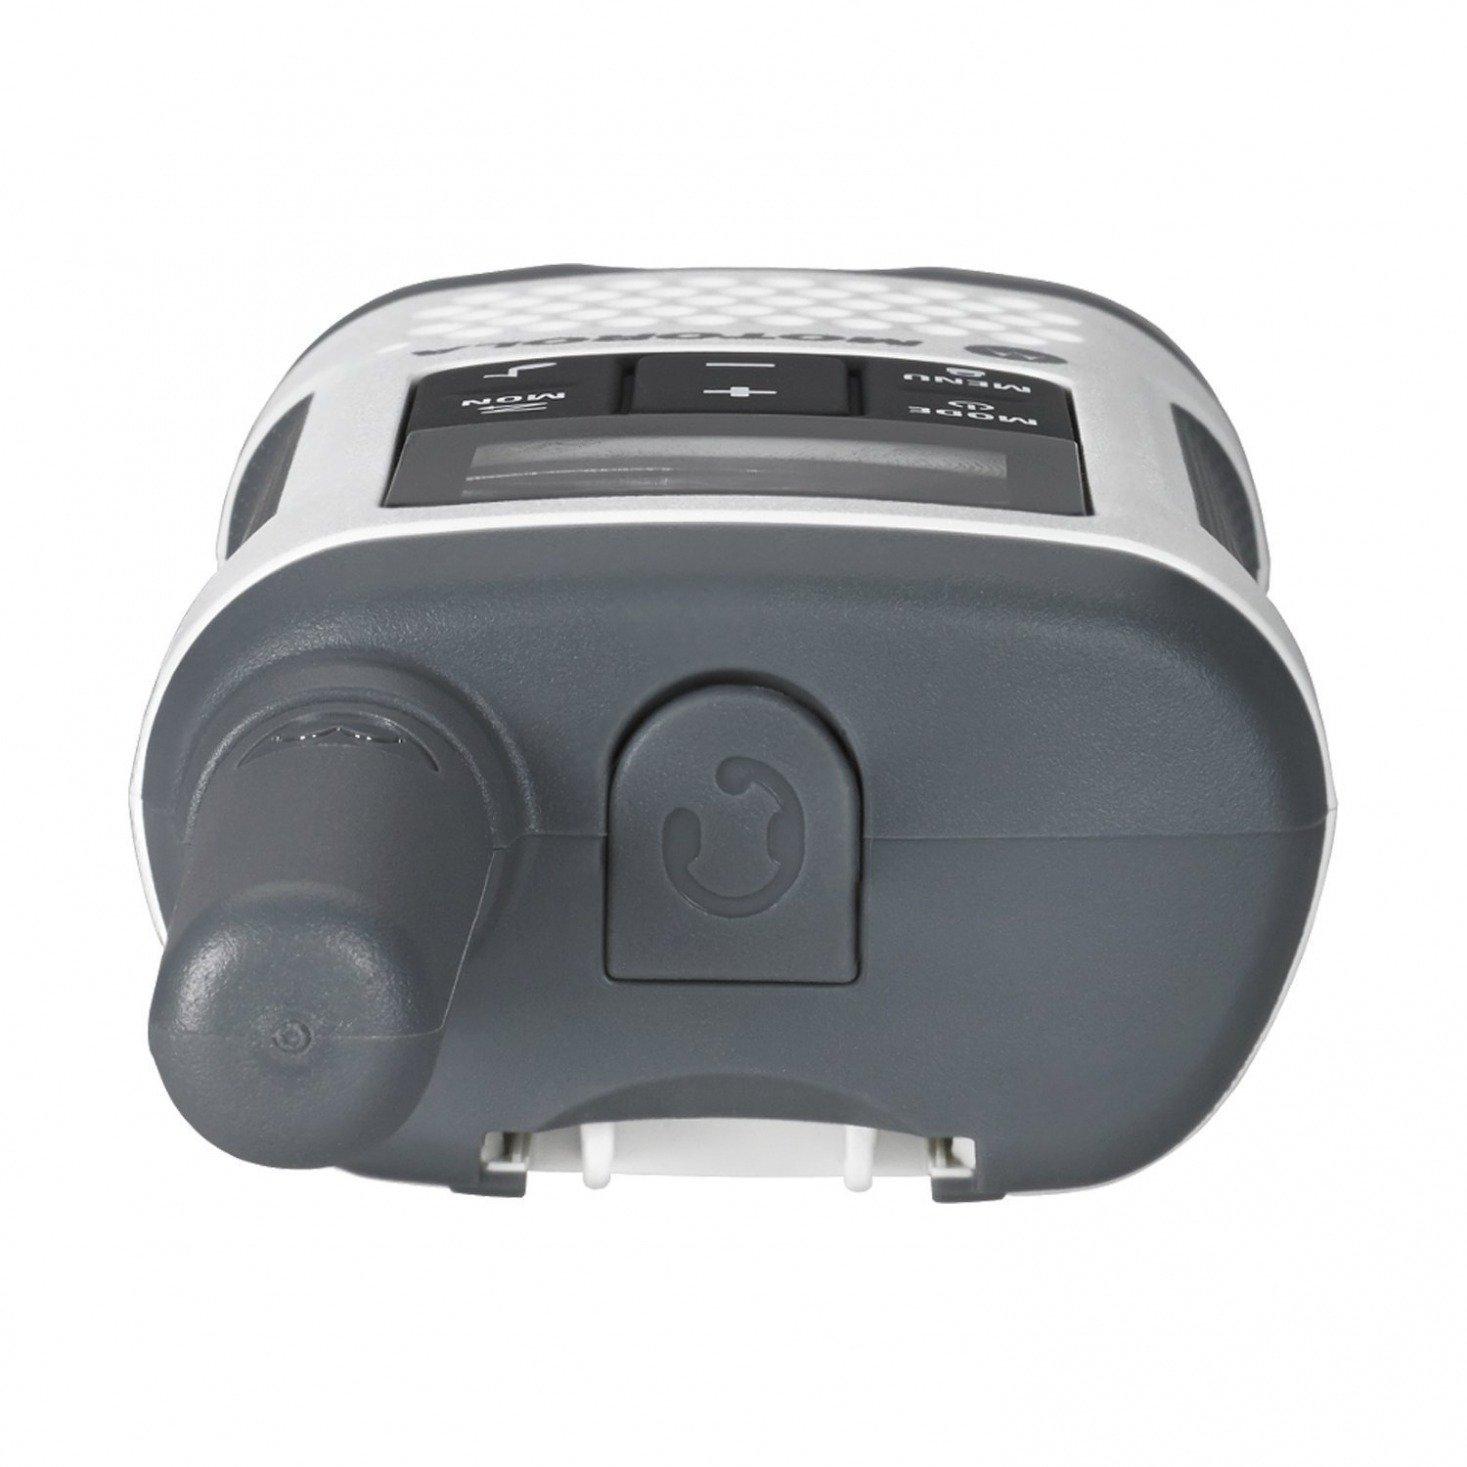 Walkie Talkie, Motorola Talkabout T260tp White Walkie Talkie Rechargeable, 3pk by By-Motorola Solutions (Image #2)